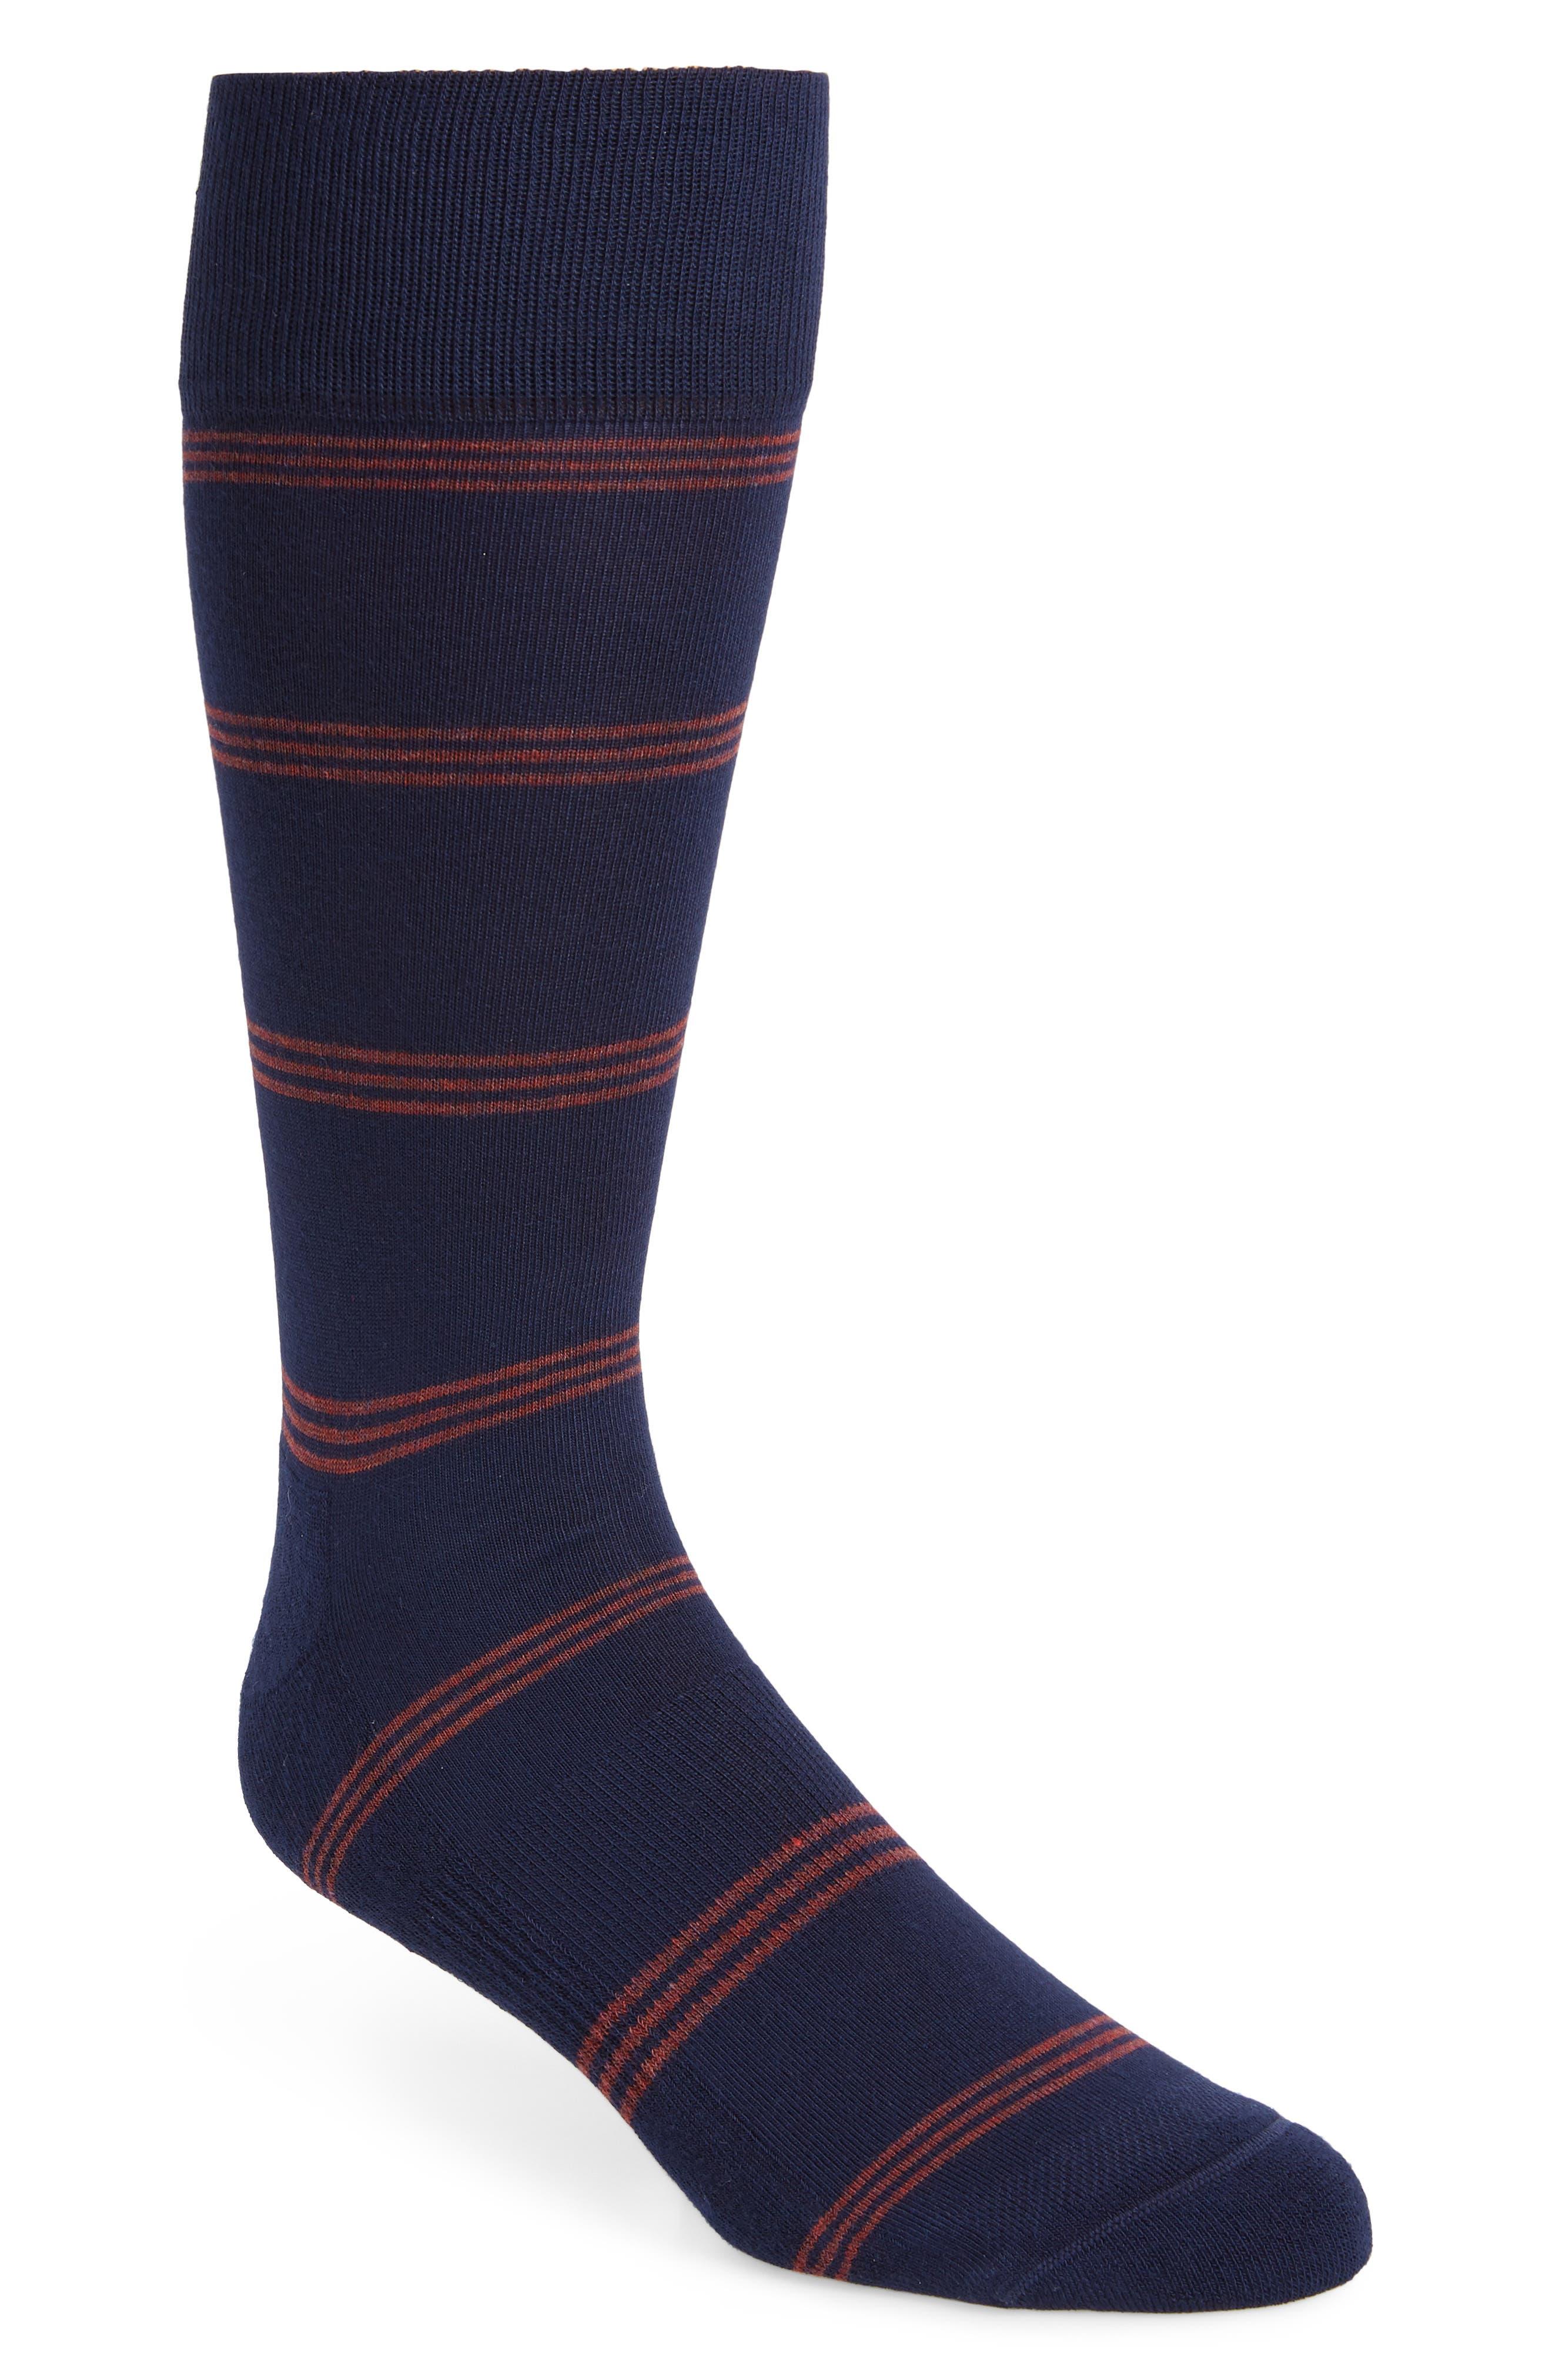 Triple Line Socks,                             Main thumbnail 1, color,                             Navy/ Red